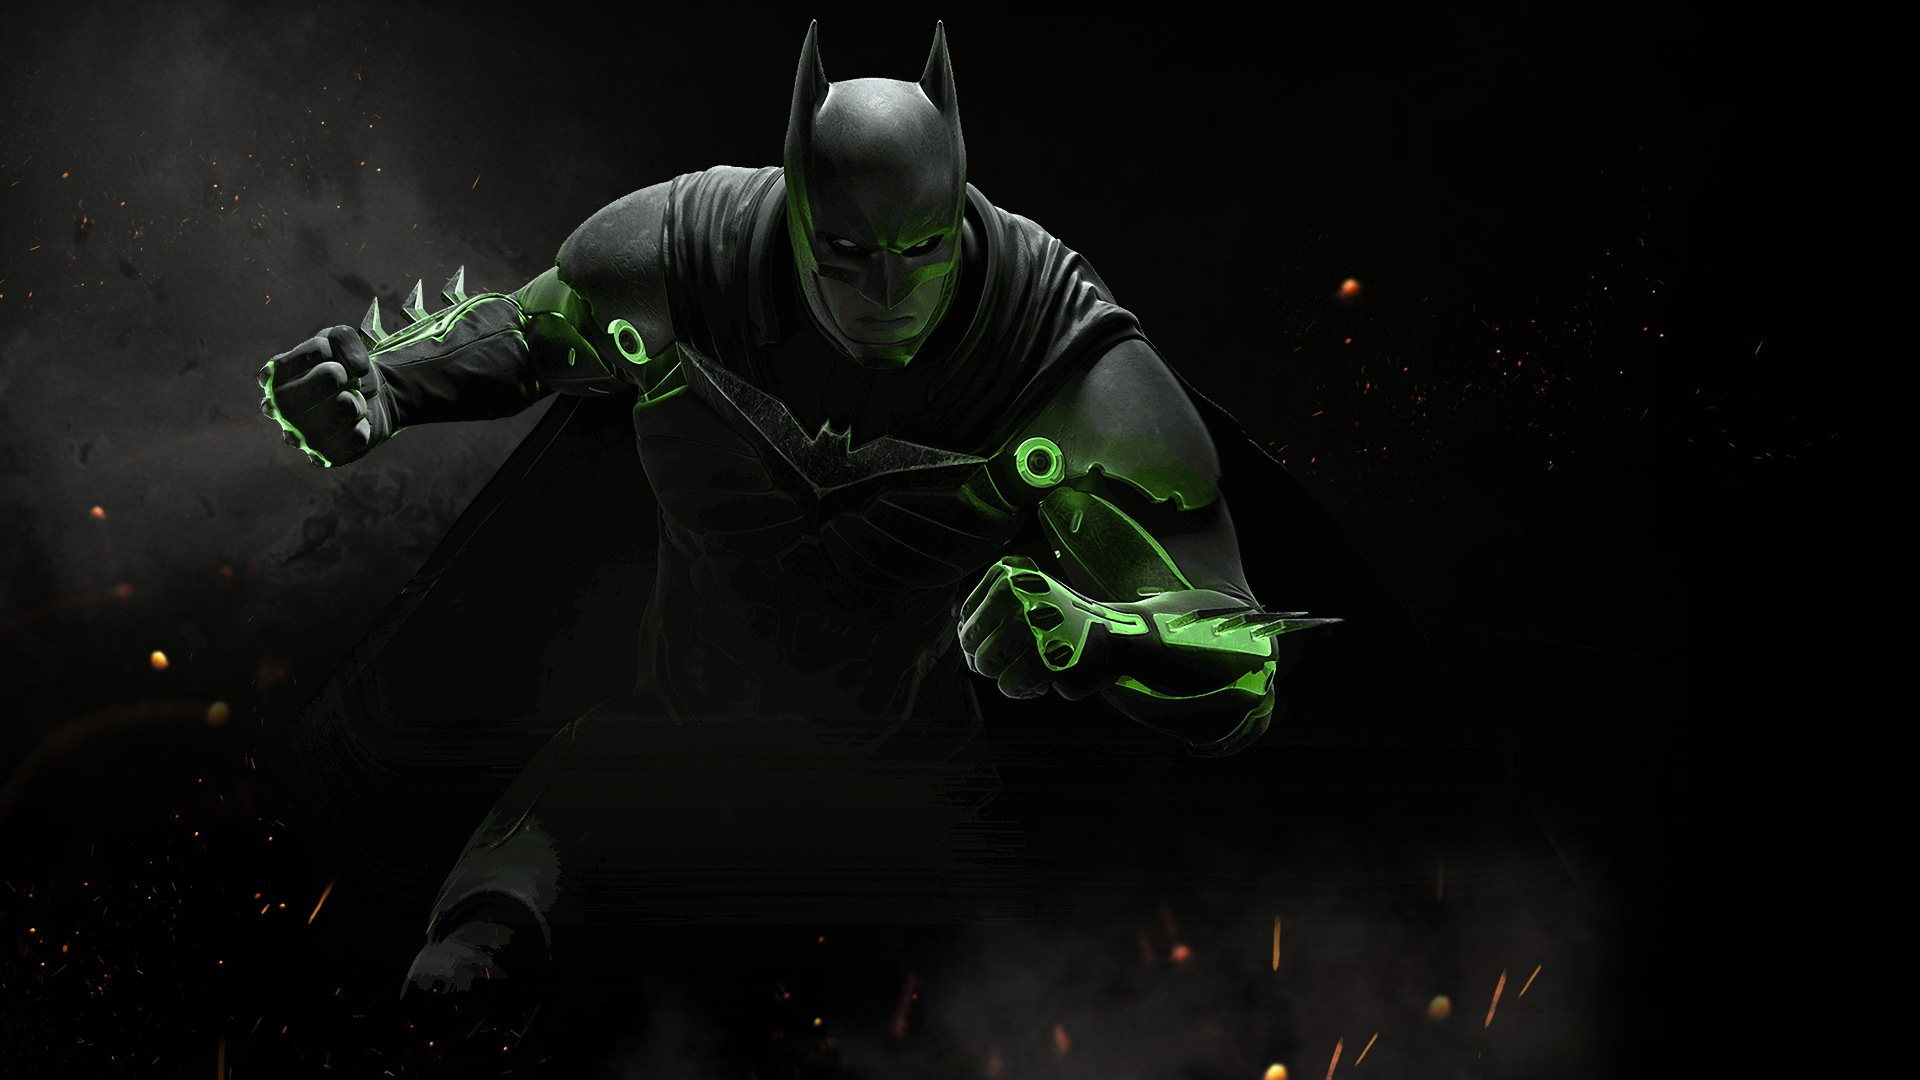 Batman Injustice 2 HD Games 4k Wallpapers Images Backgrounds